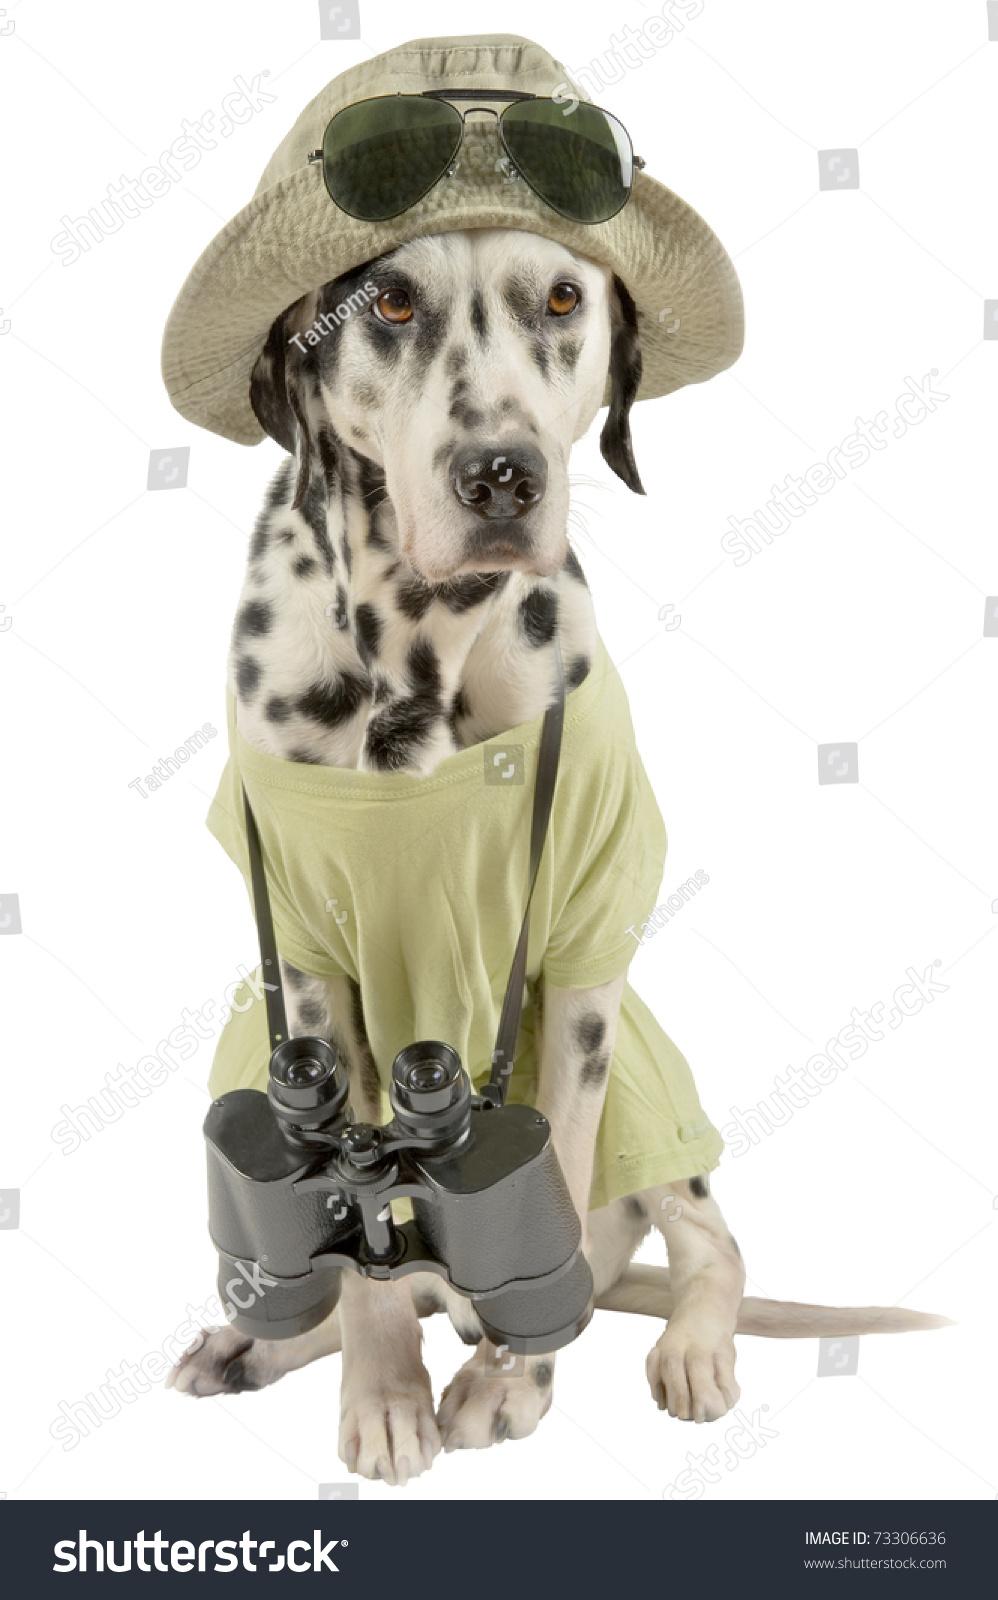 Dalmatian traveler. Acting dog. Focus on head.